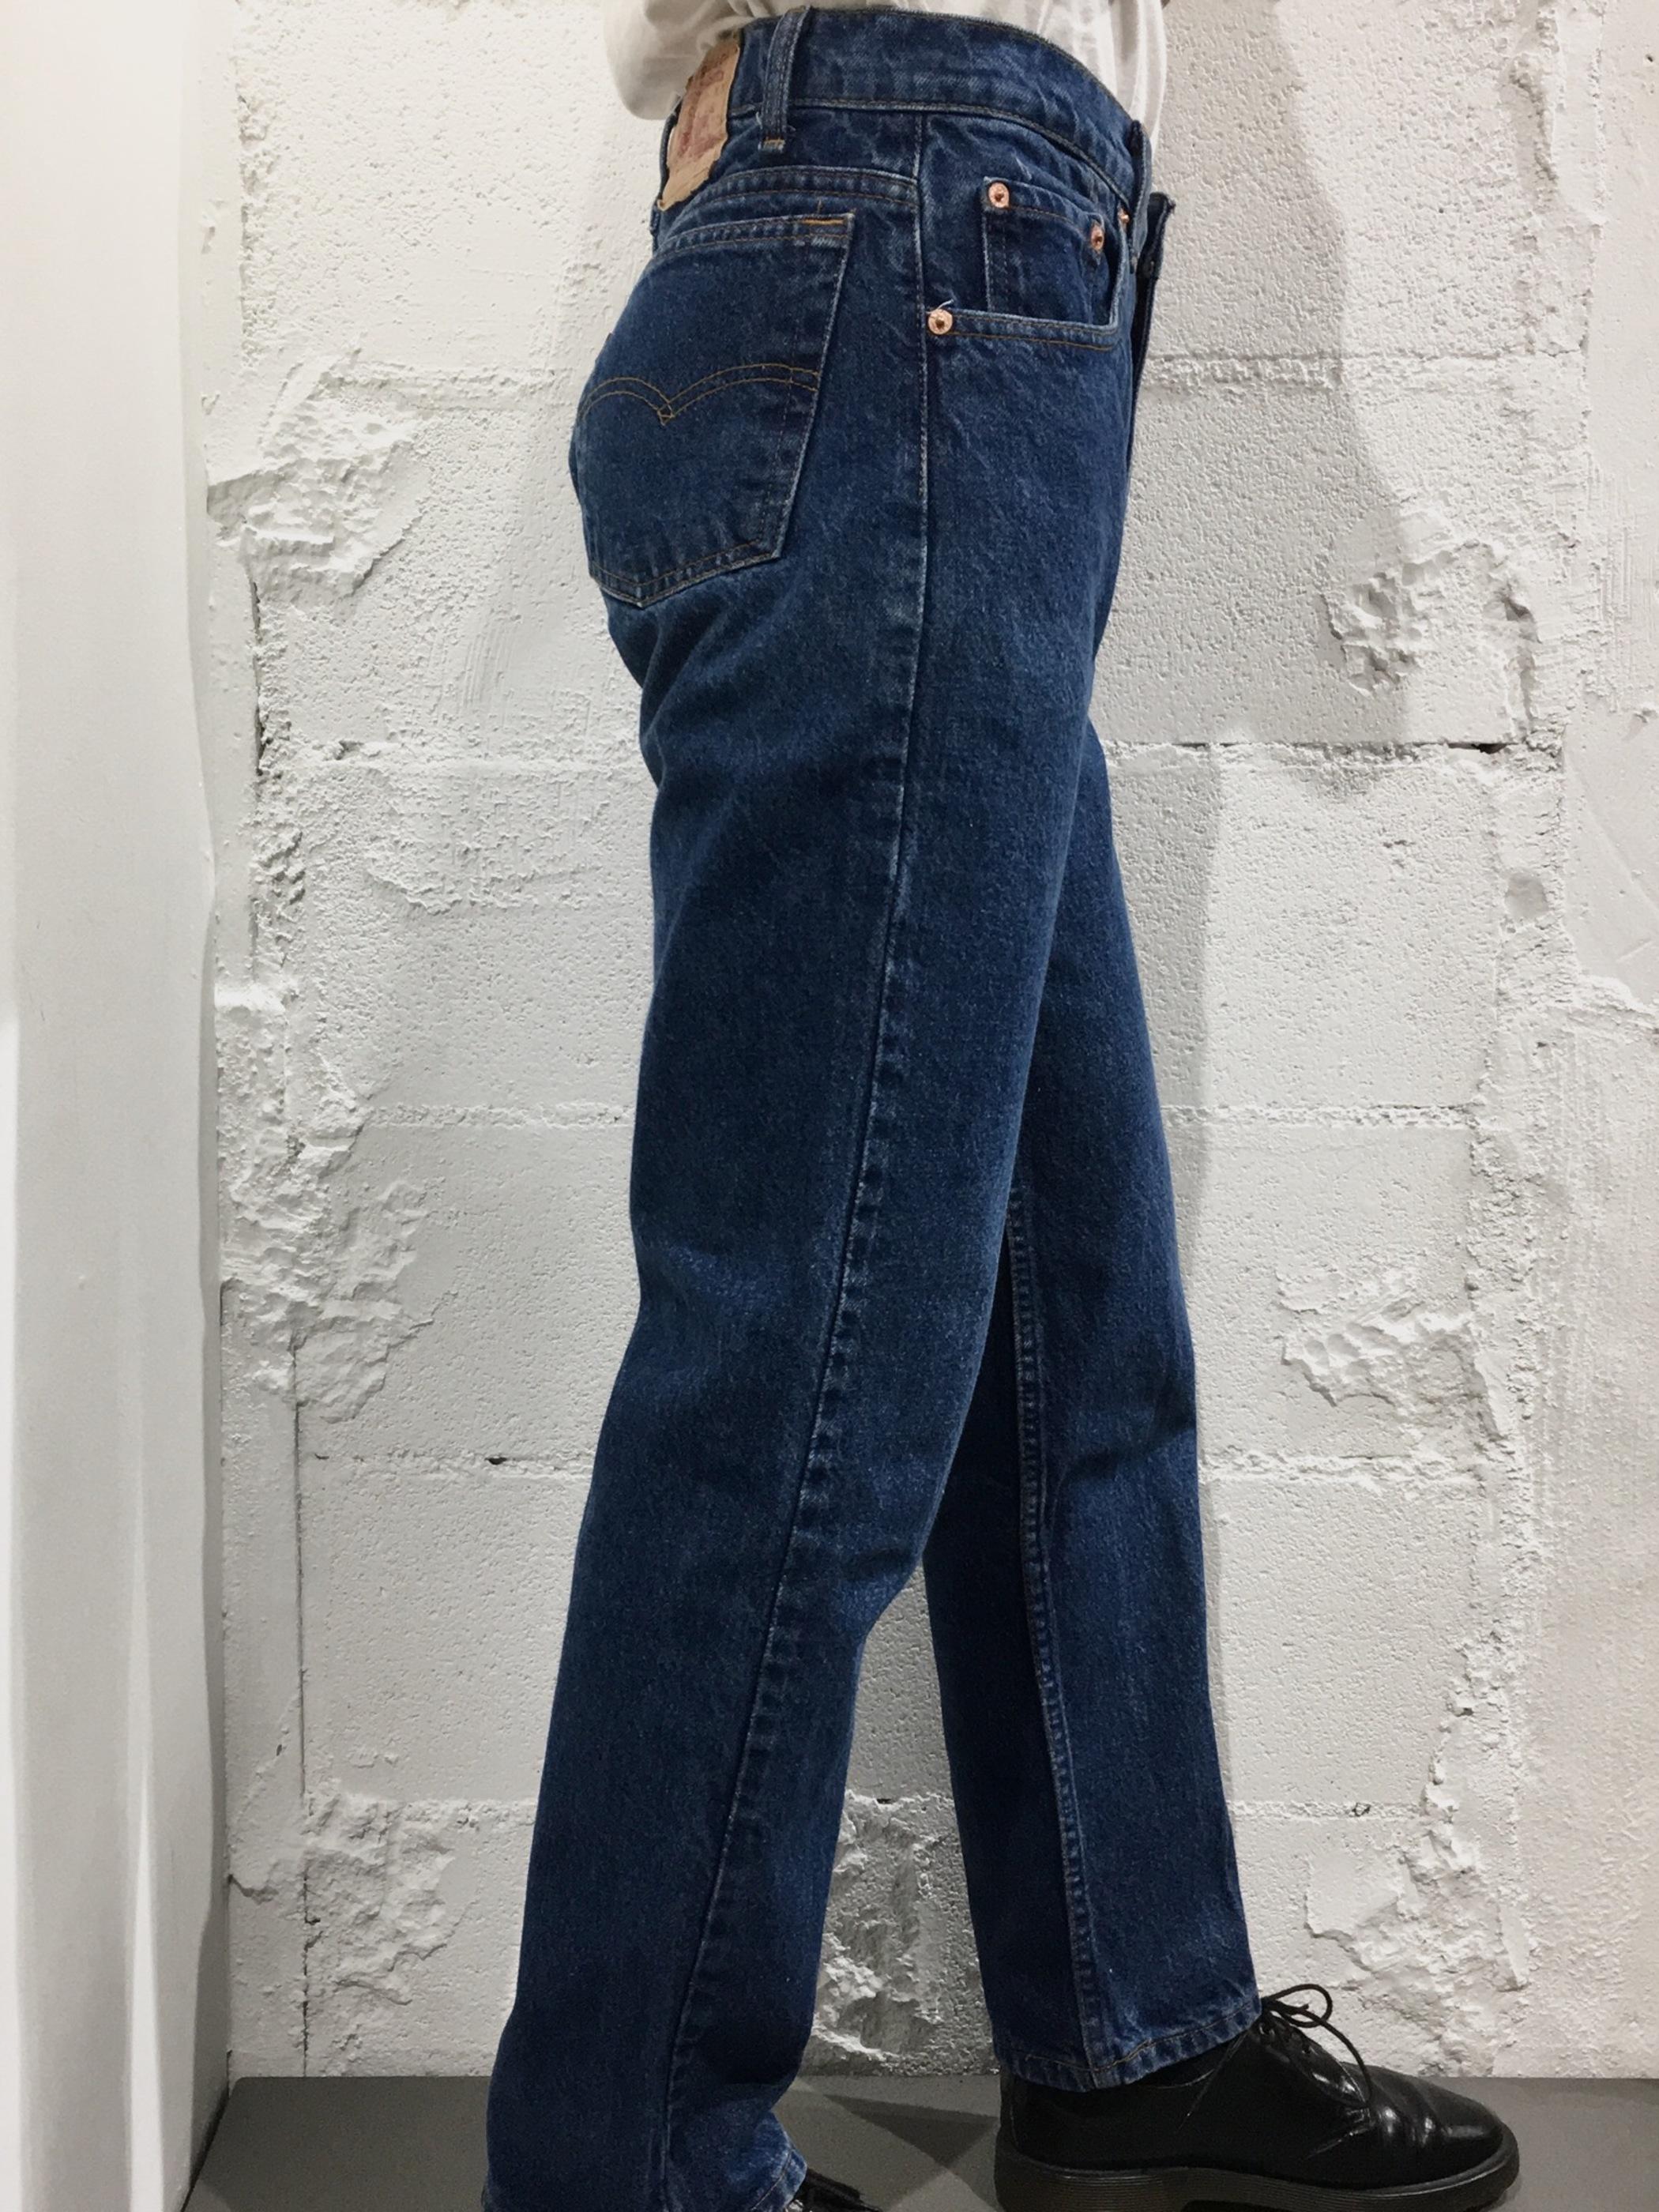 Levi's 505 denim pants